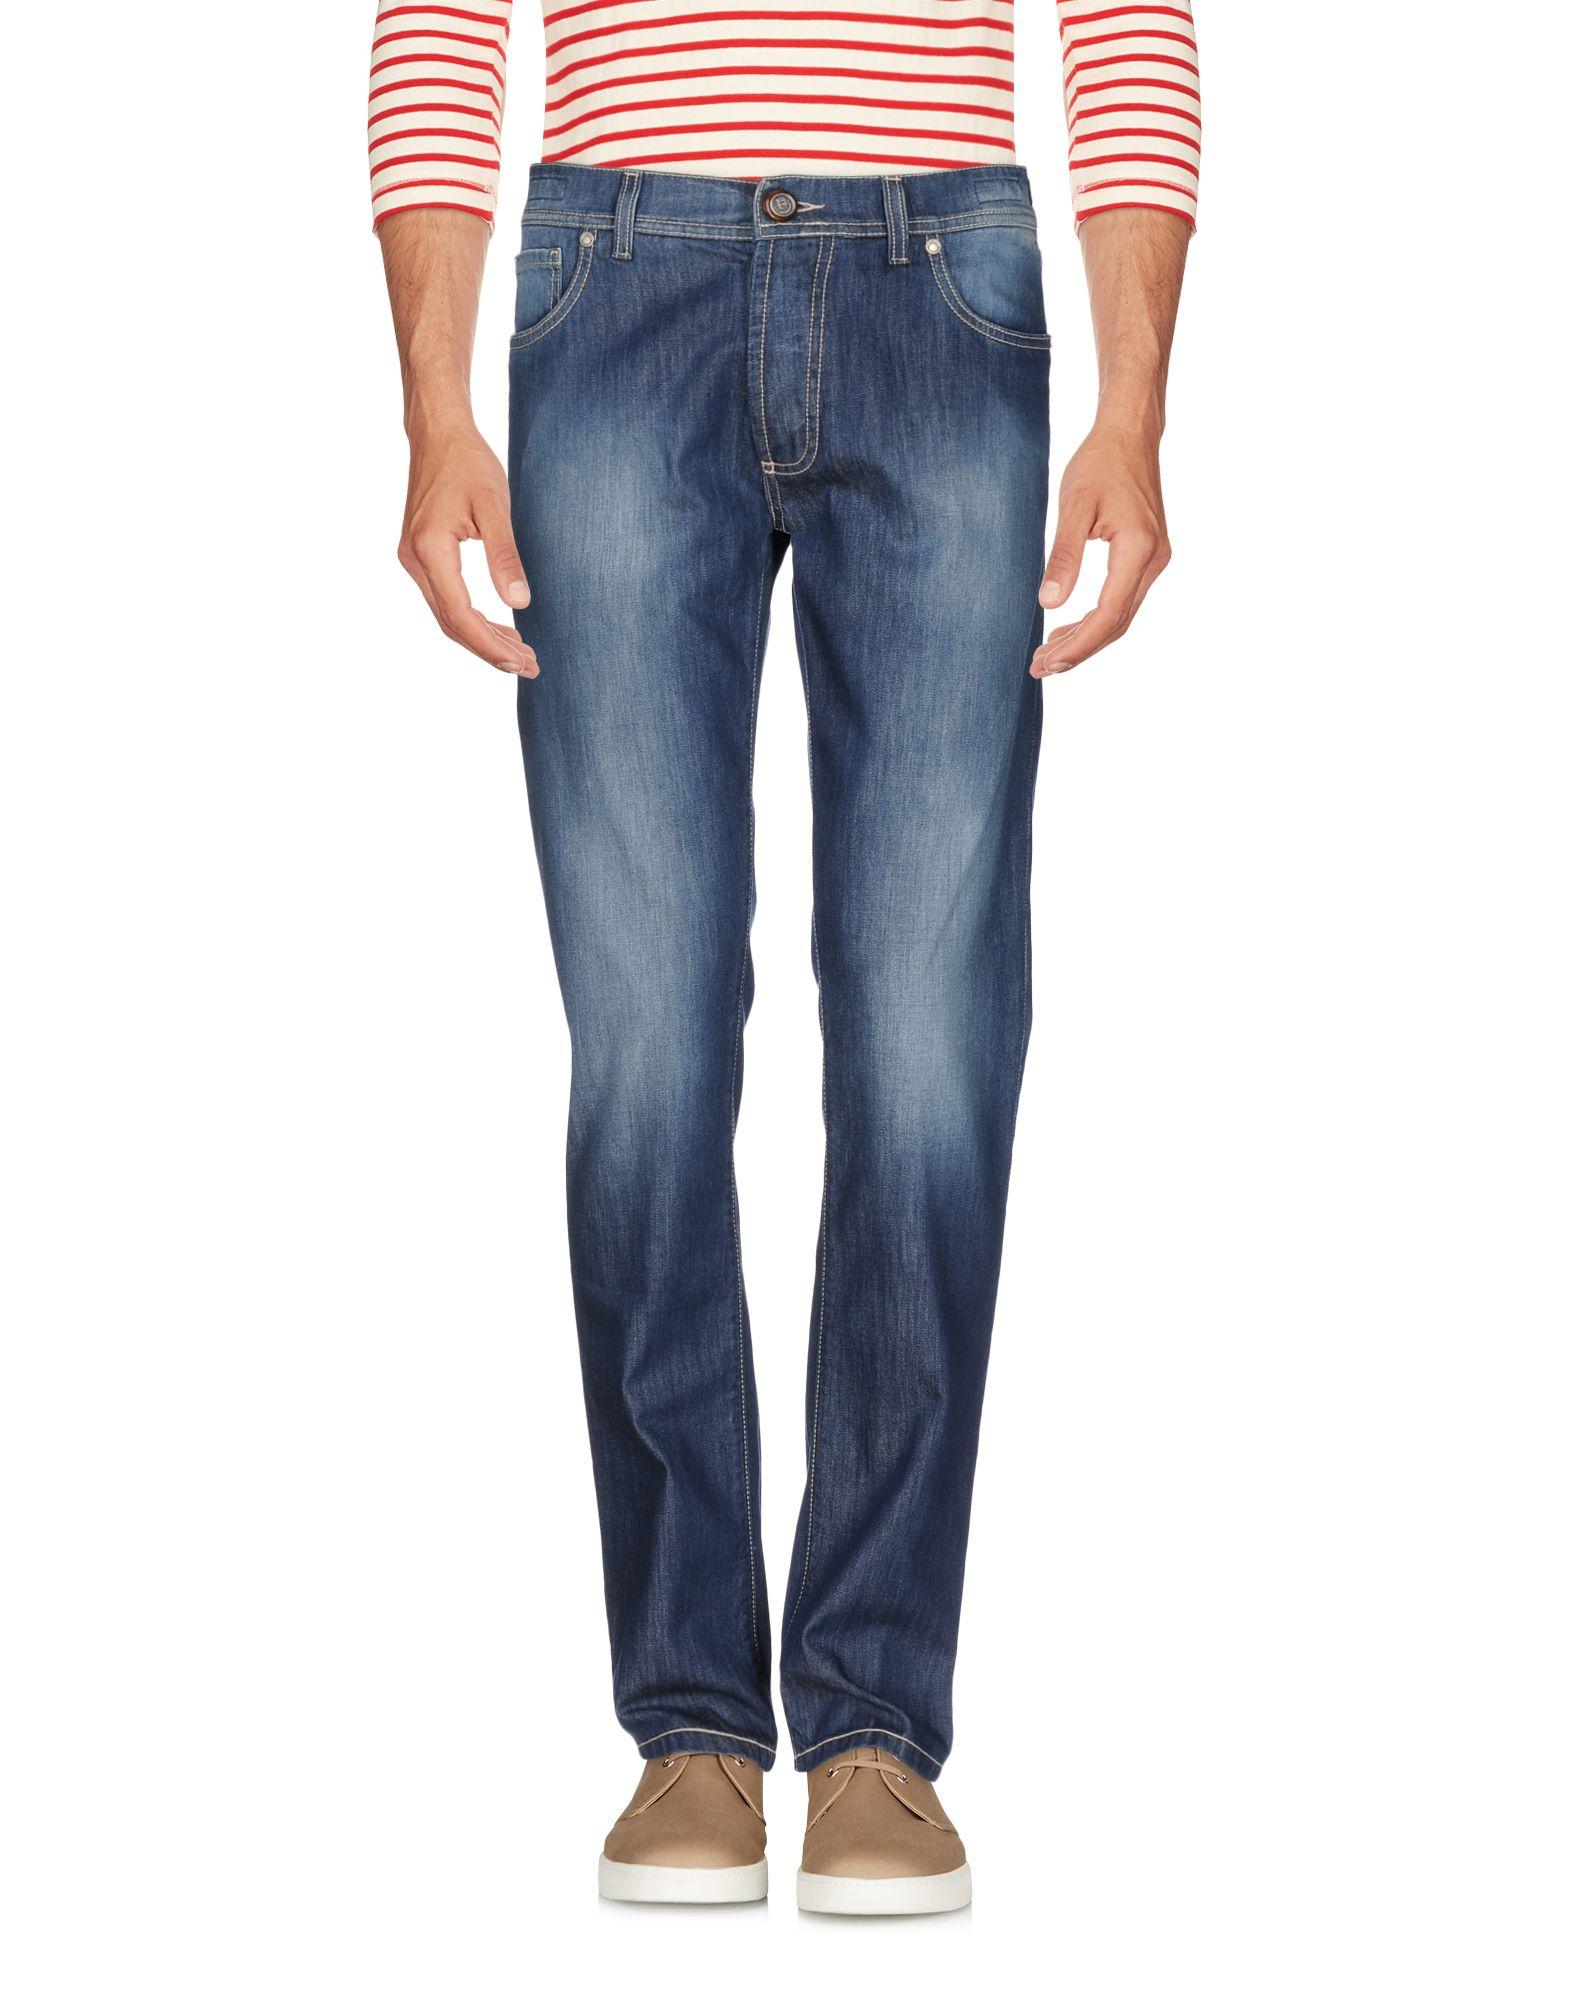 Pantaloni Jeans Richard James Brown Uomo - Acquista online su